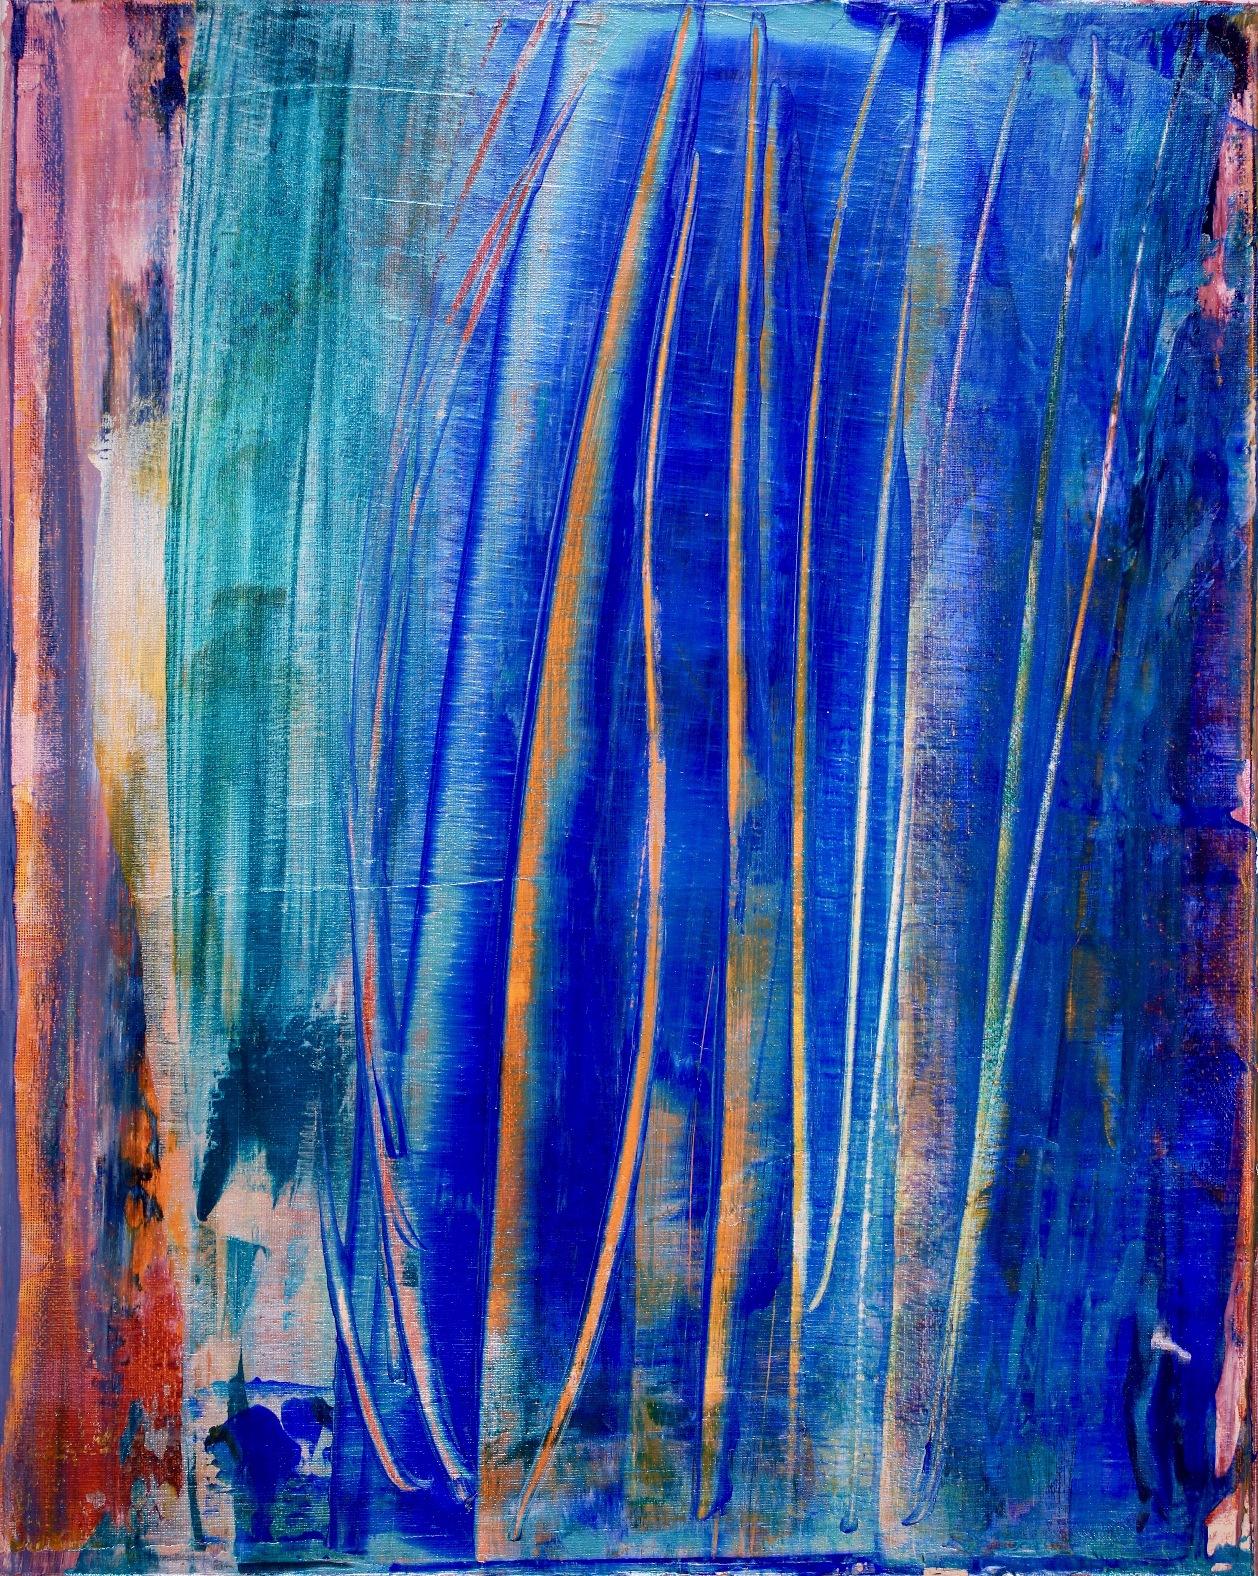 SOLD - Interrupted Frequencies (2018) - Left Canvas / Diptych / Artist: Nestor Toro